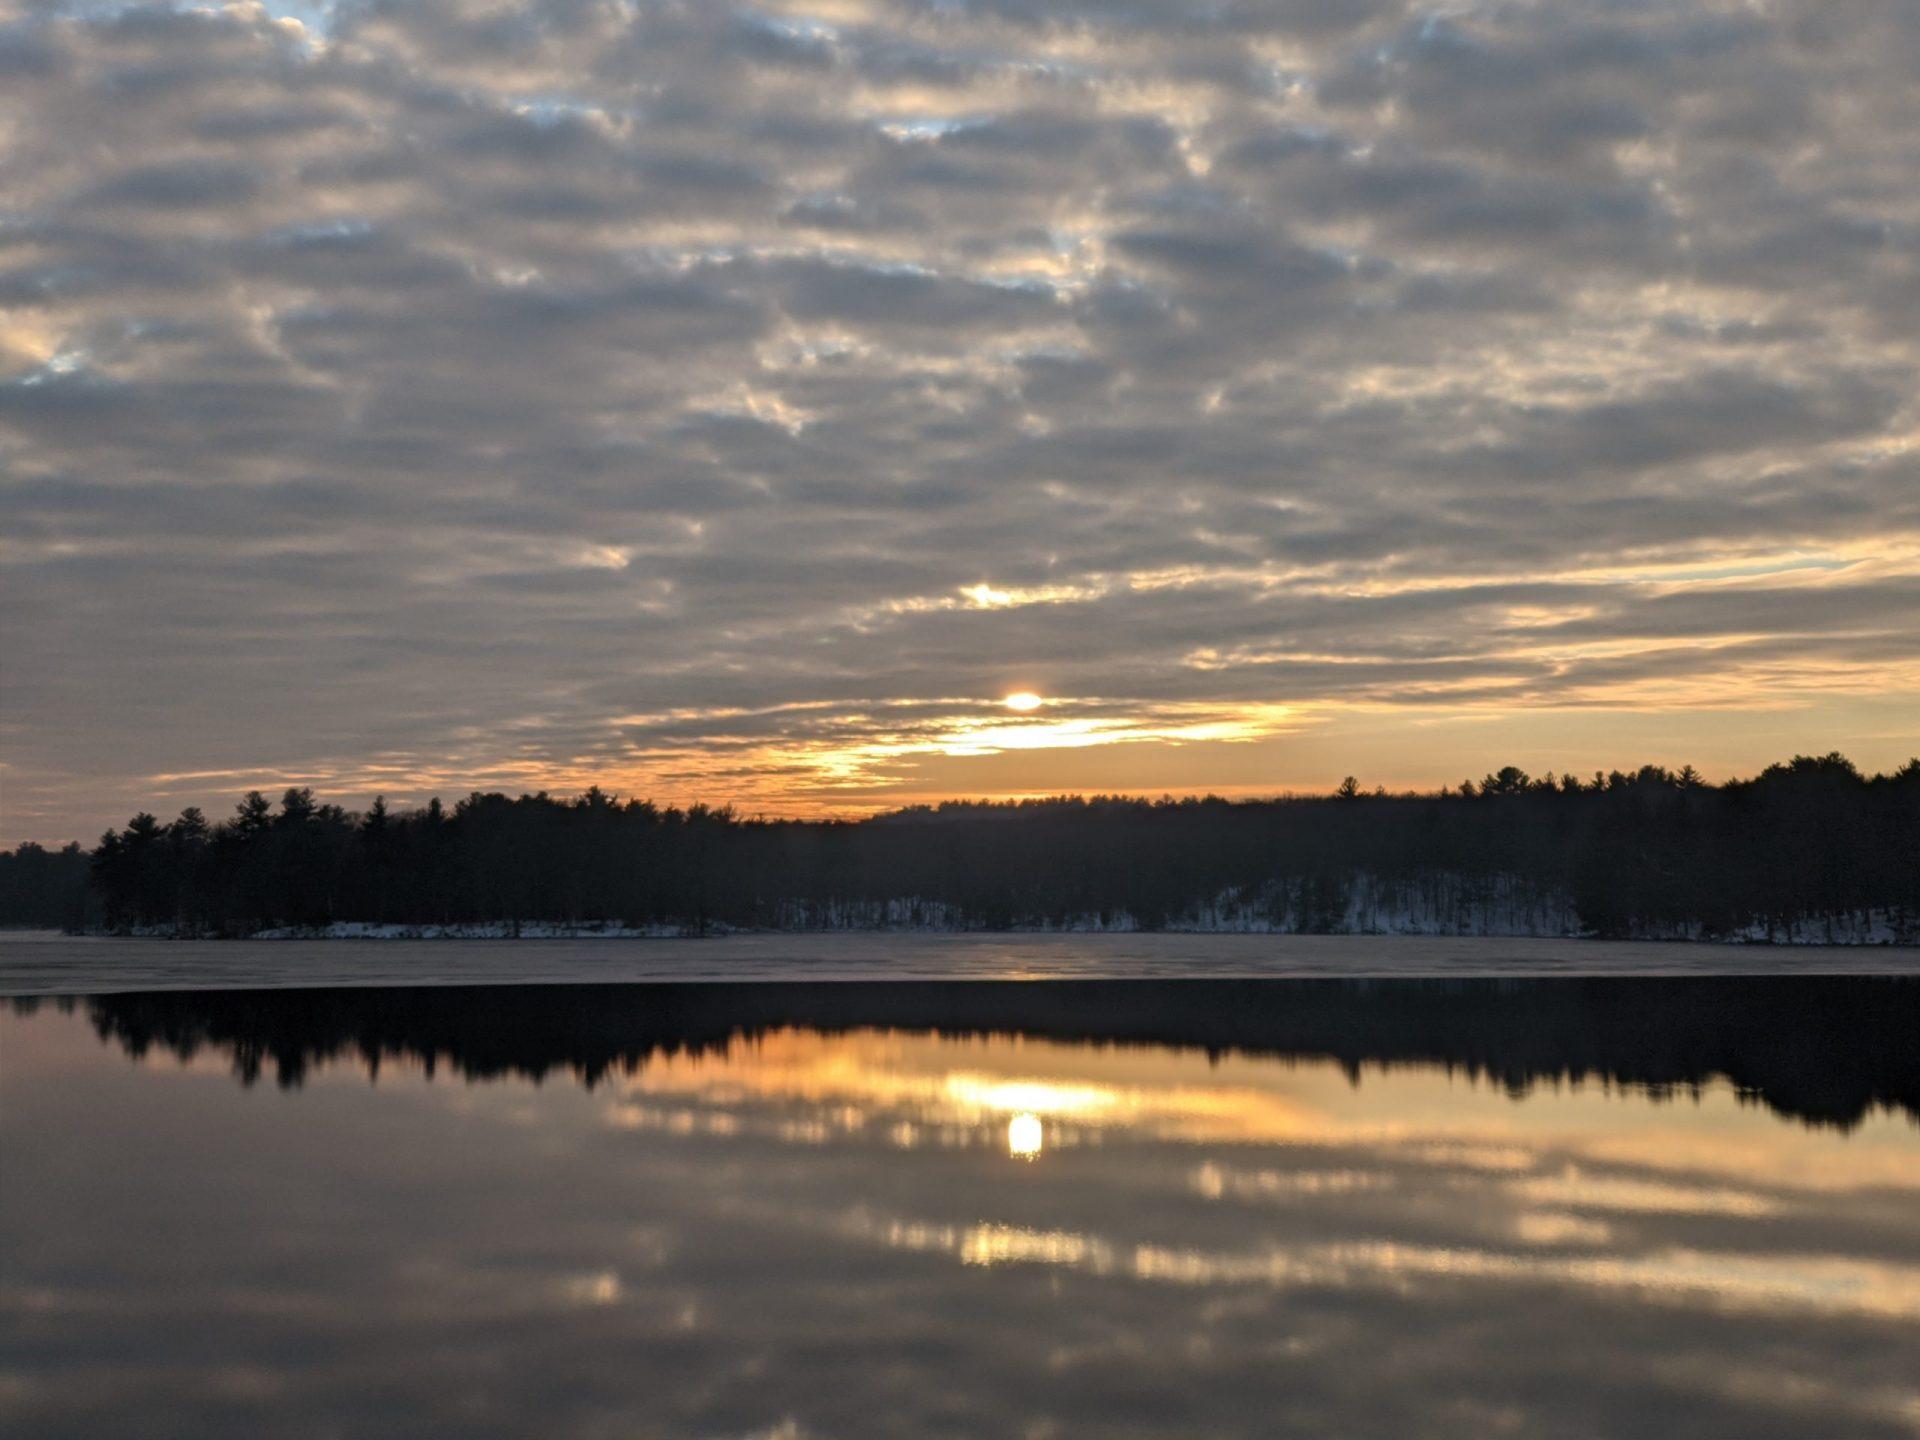 Sunset December 2020 - Ashland Reservoir